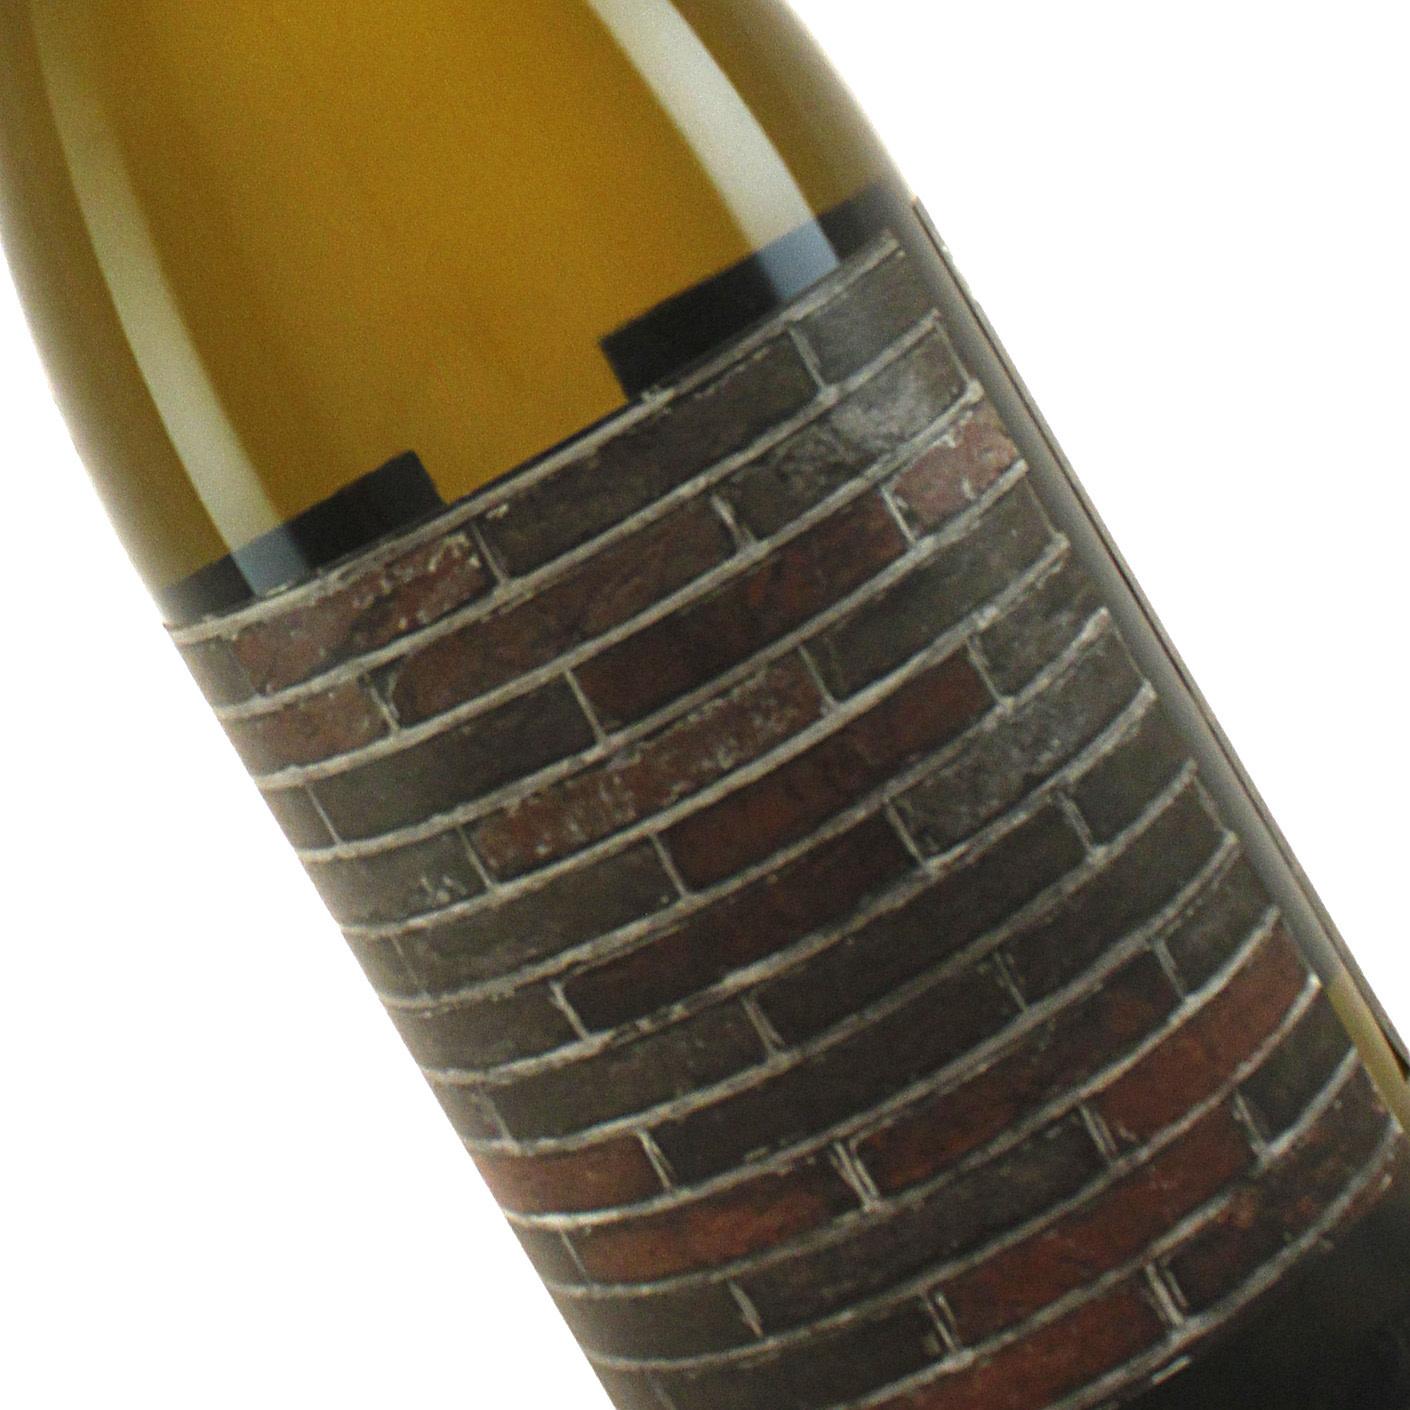 Brick & Mortar 2018 Chardonnay Cougar Rock Vineyard, Napa Valley